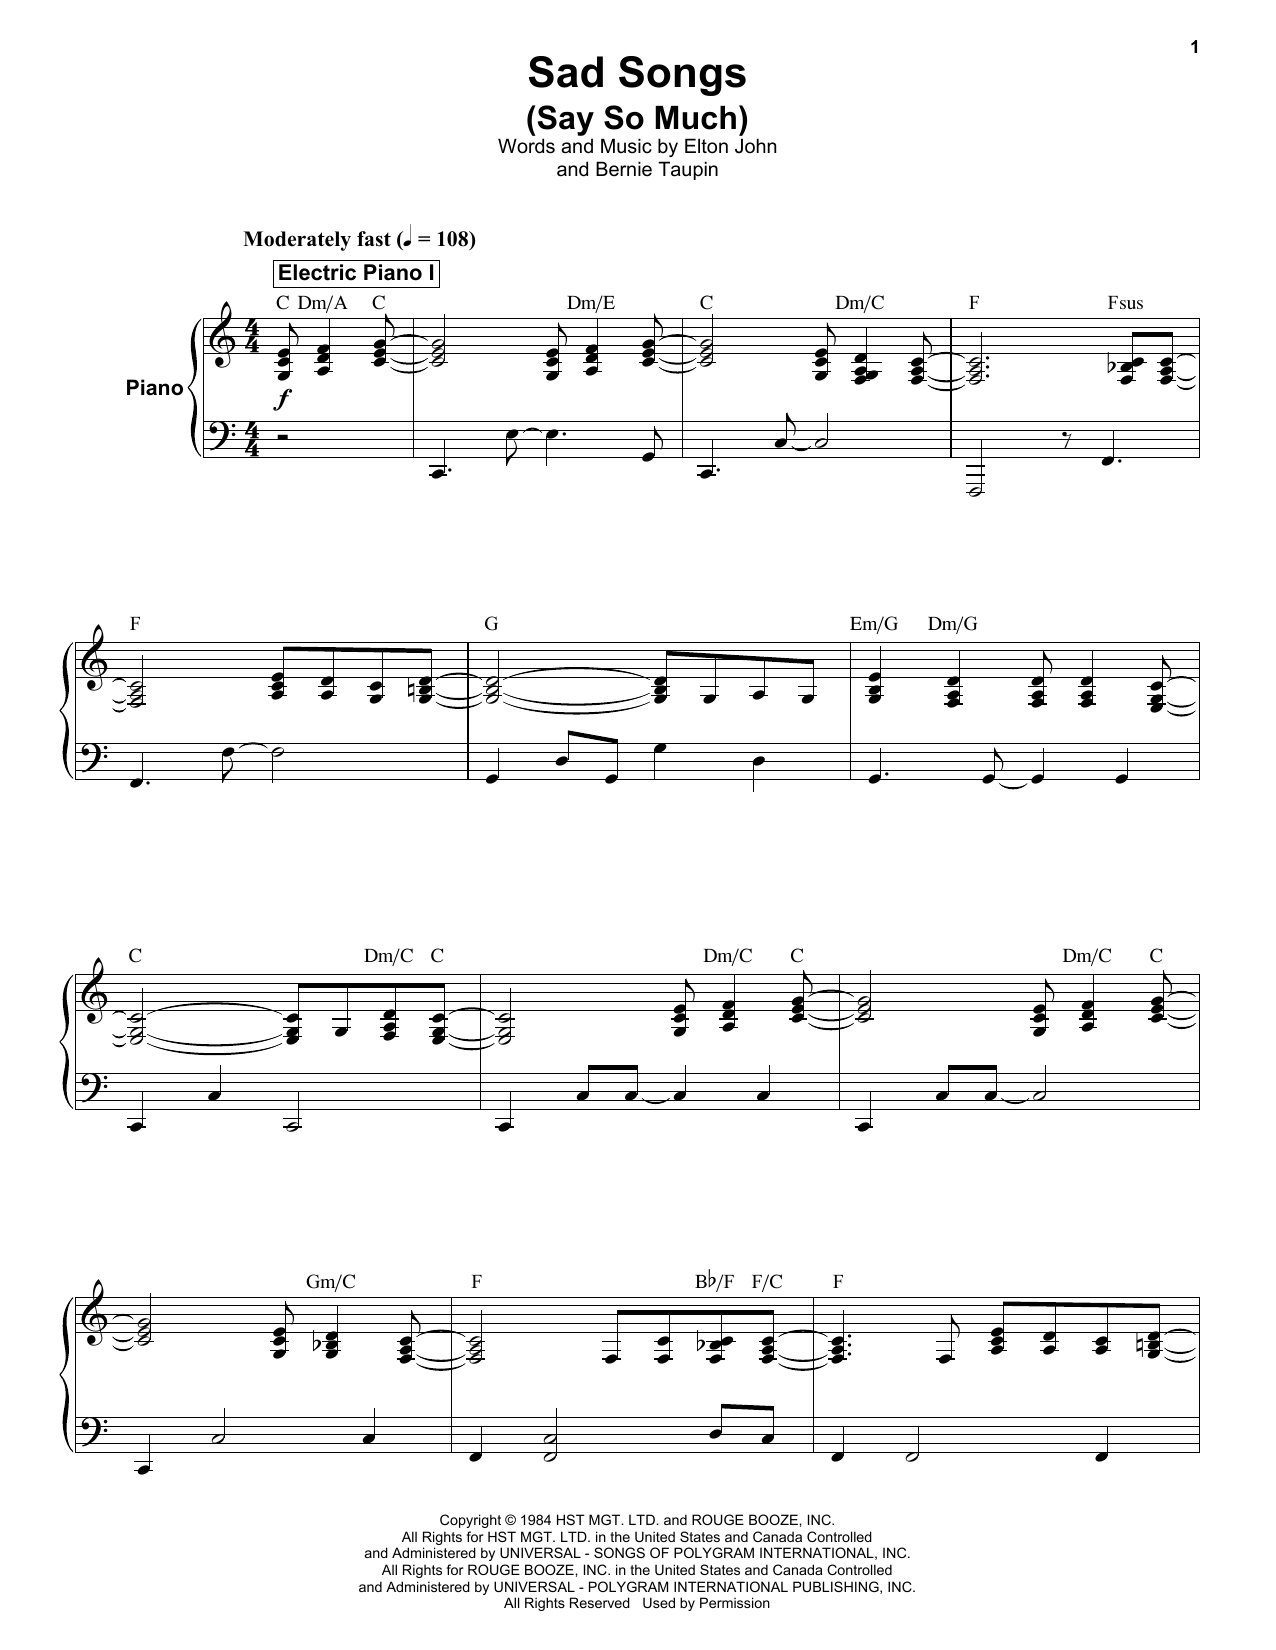 Sad Songs (Say So Much) by Elton John Piano, Vocal & Guitar (Right-Hand  Melody) Digital Sheet Music